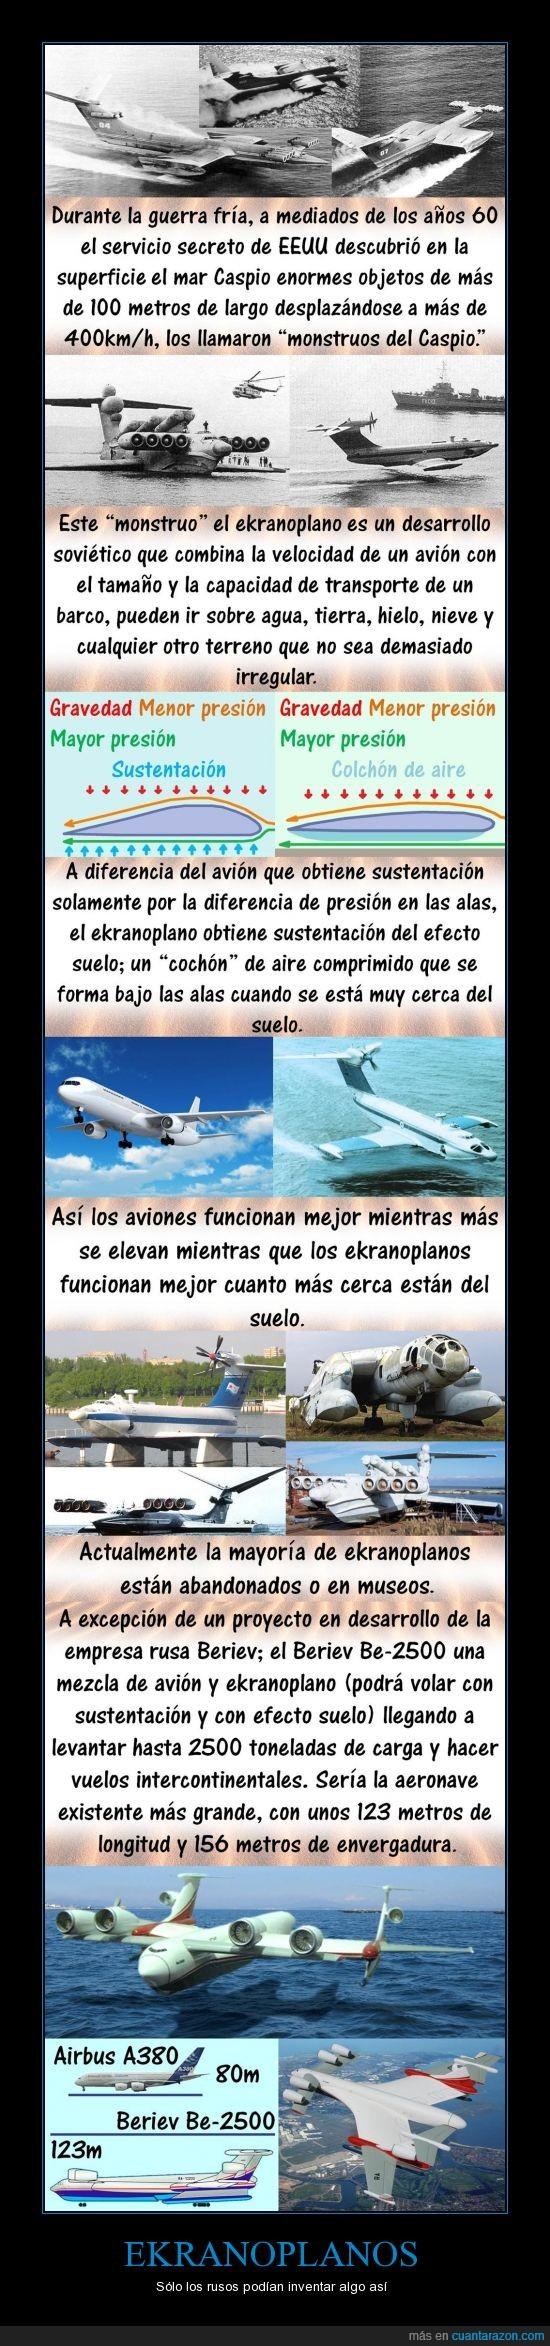 avión,ekranoplano,gigante,invento,máquina,Rusia,soviéticos